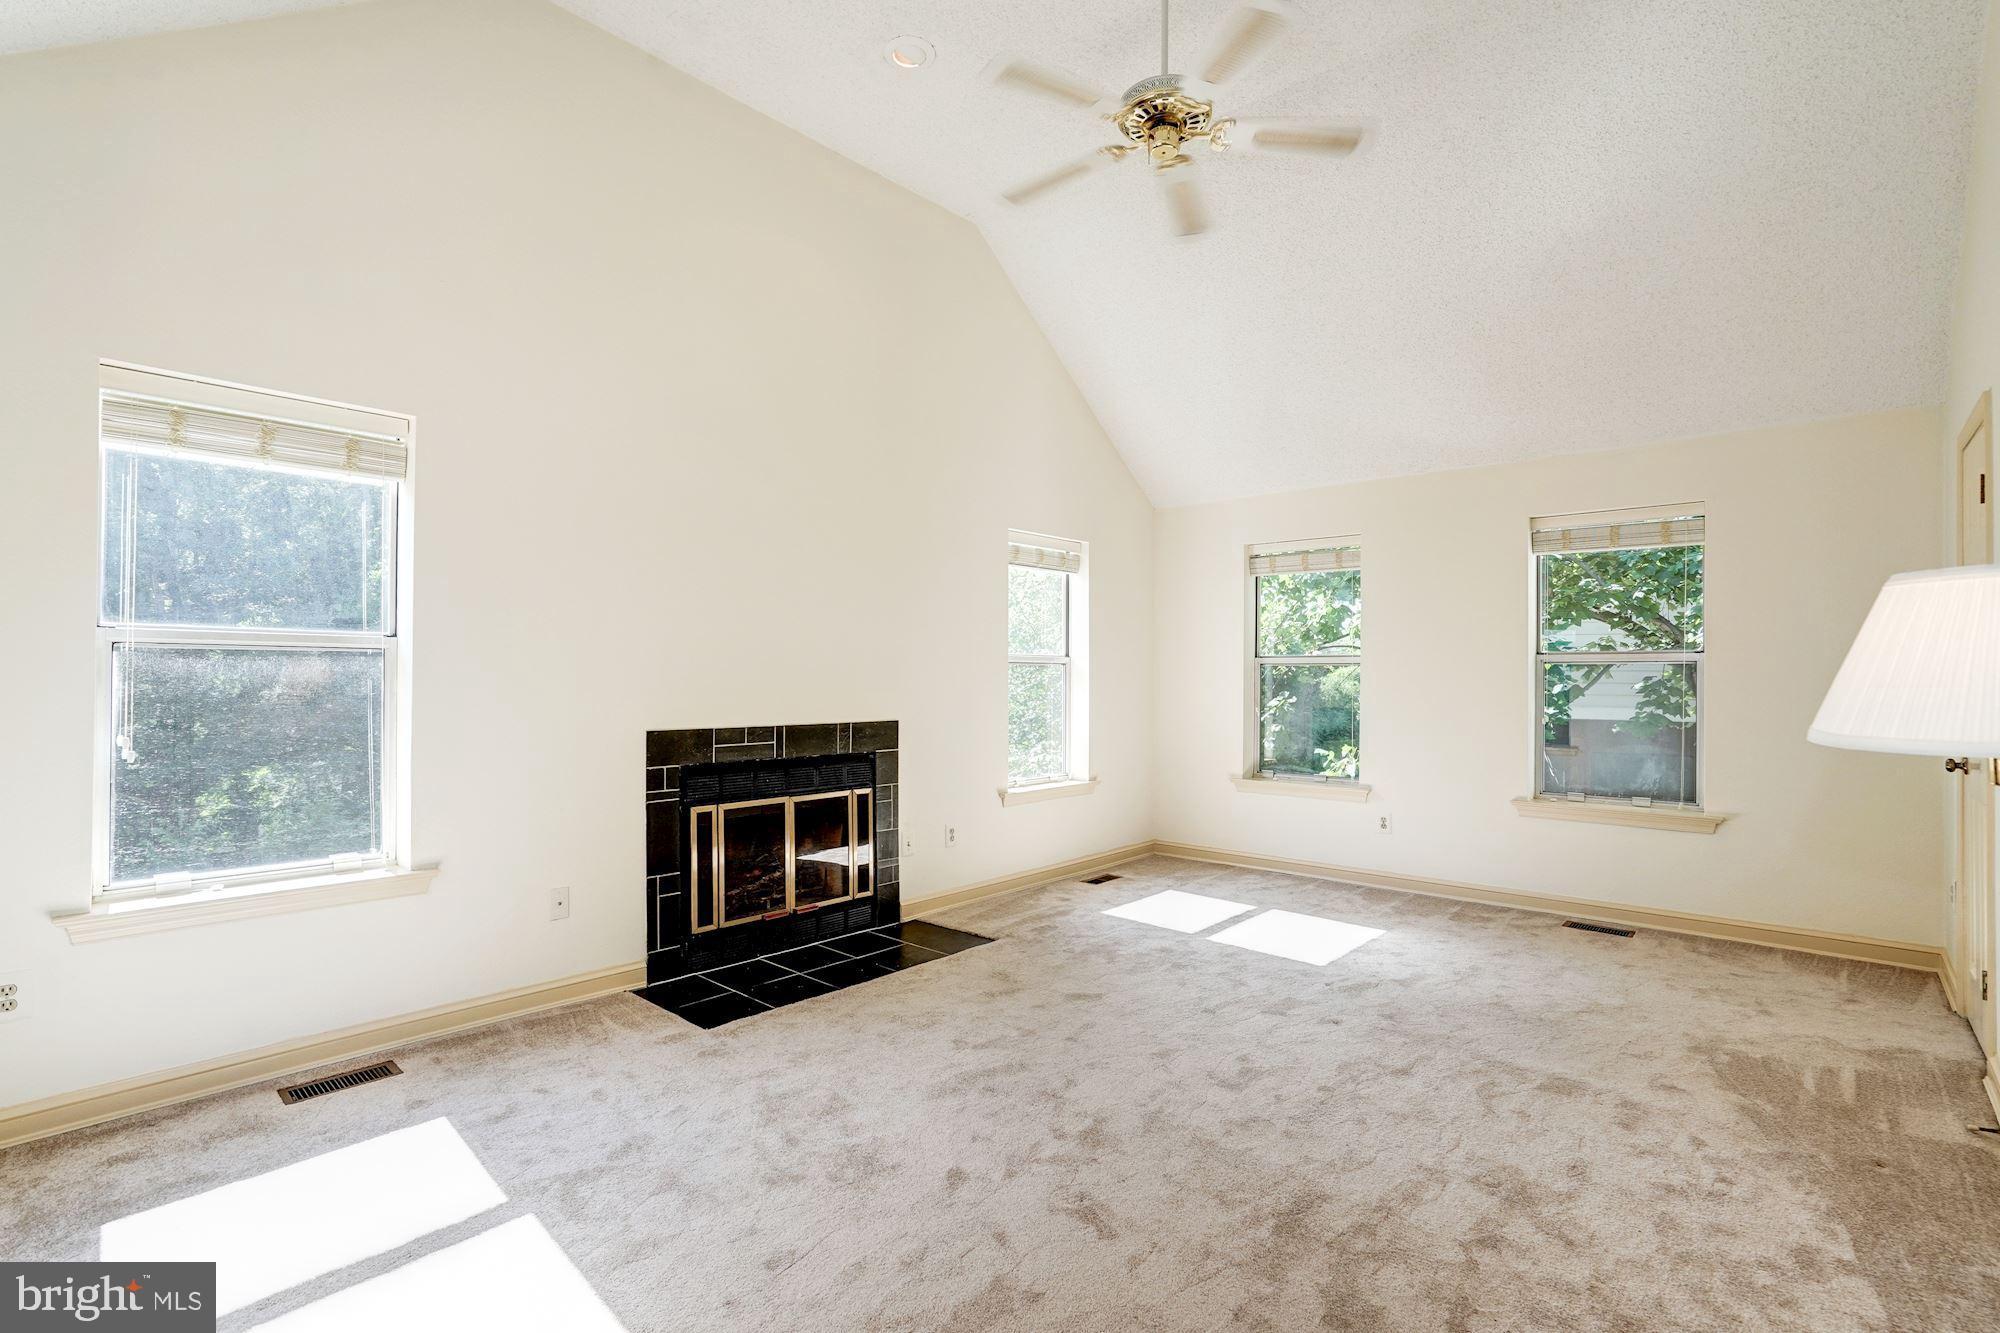 2375 N Edgewood Street, Arlington, VA 22207 | Integro Real Estate